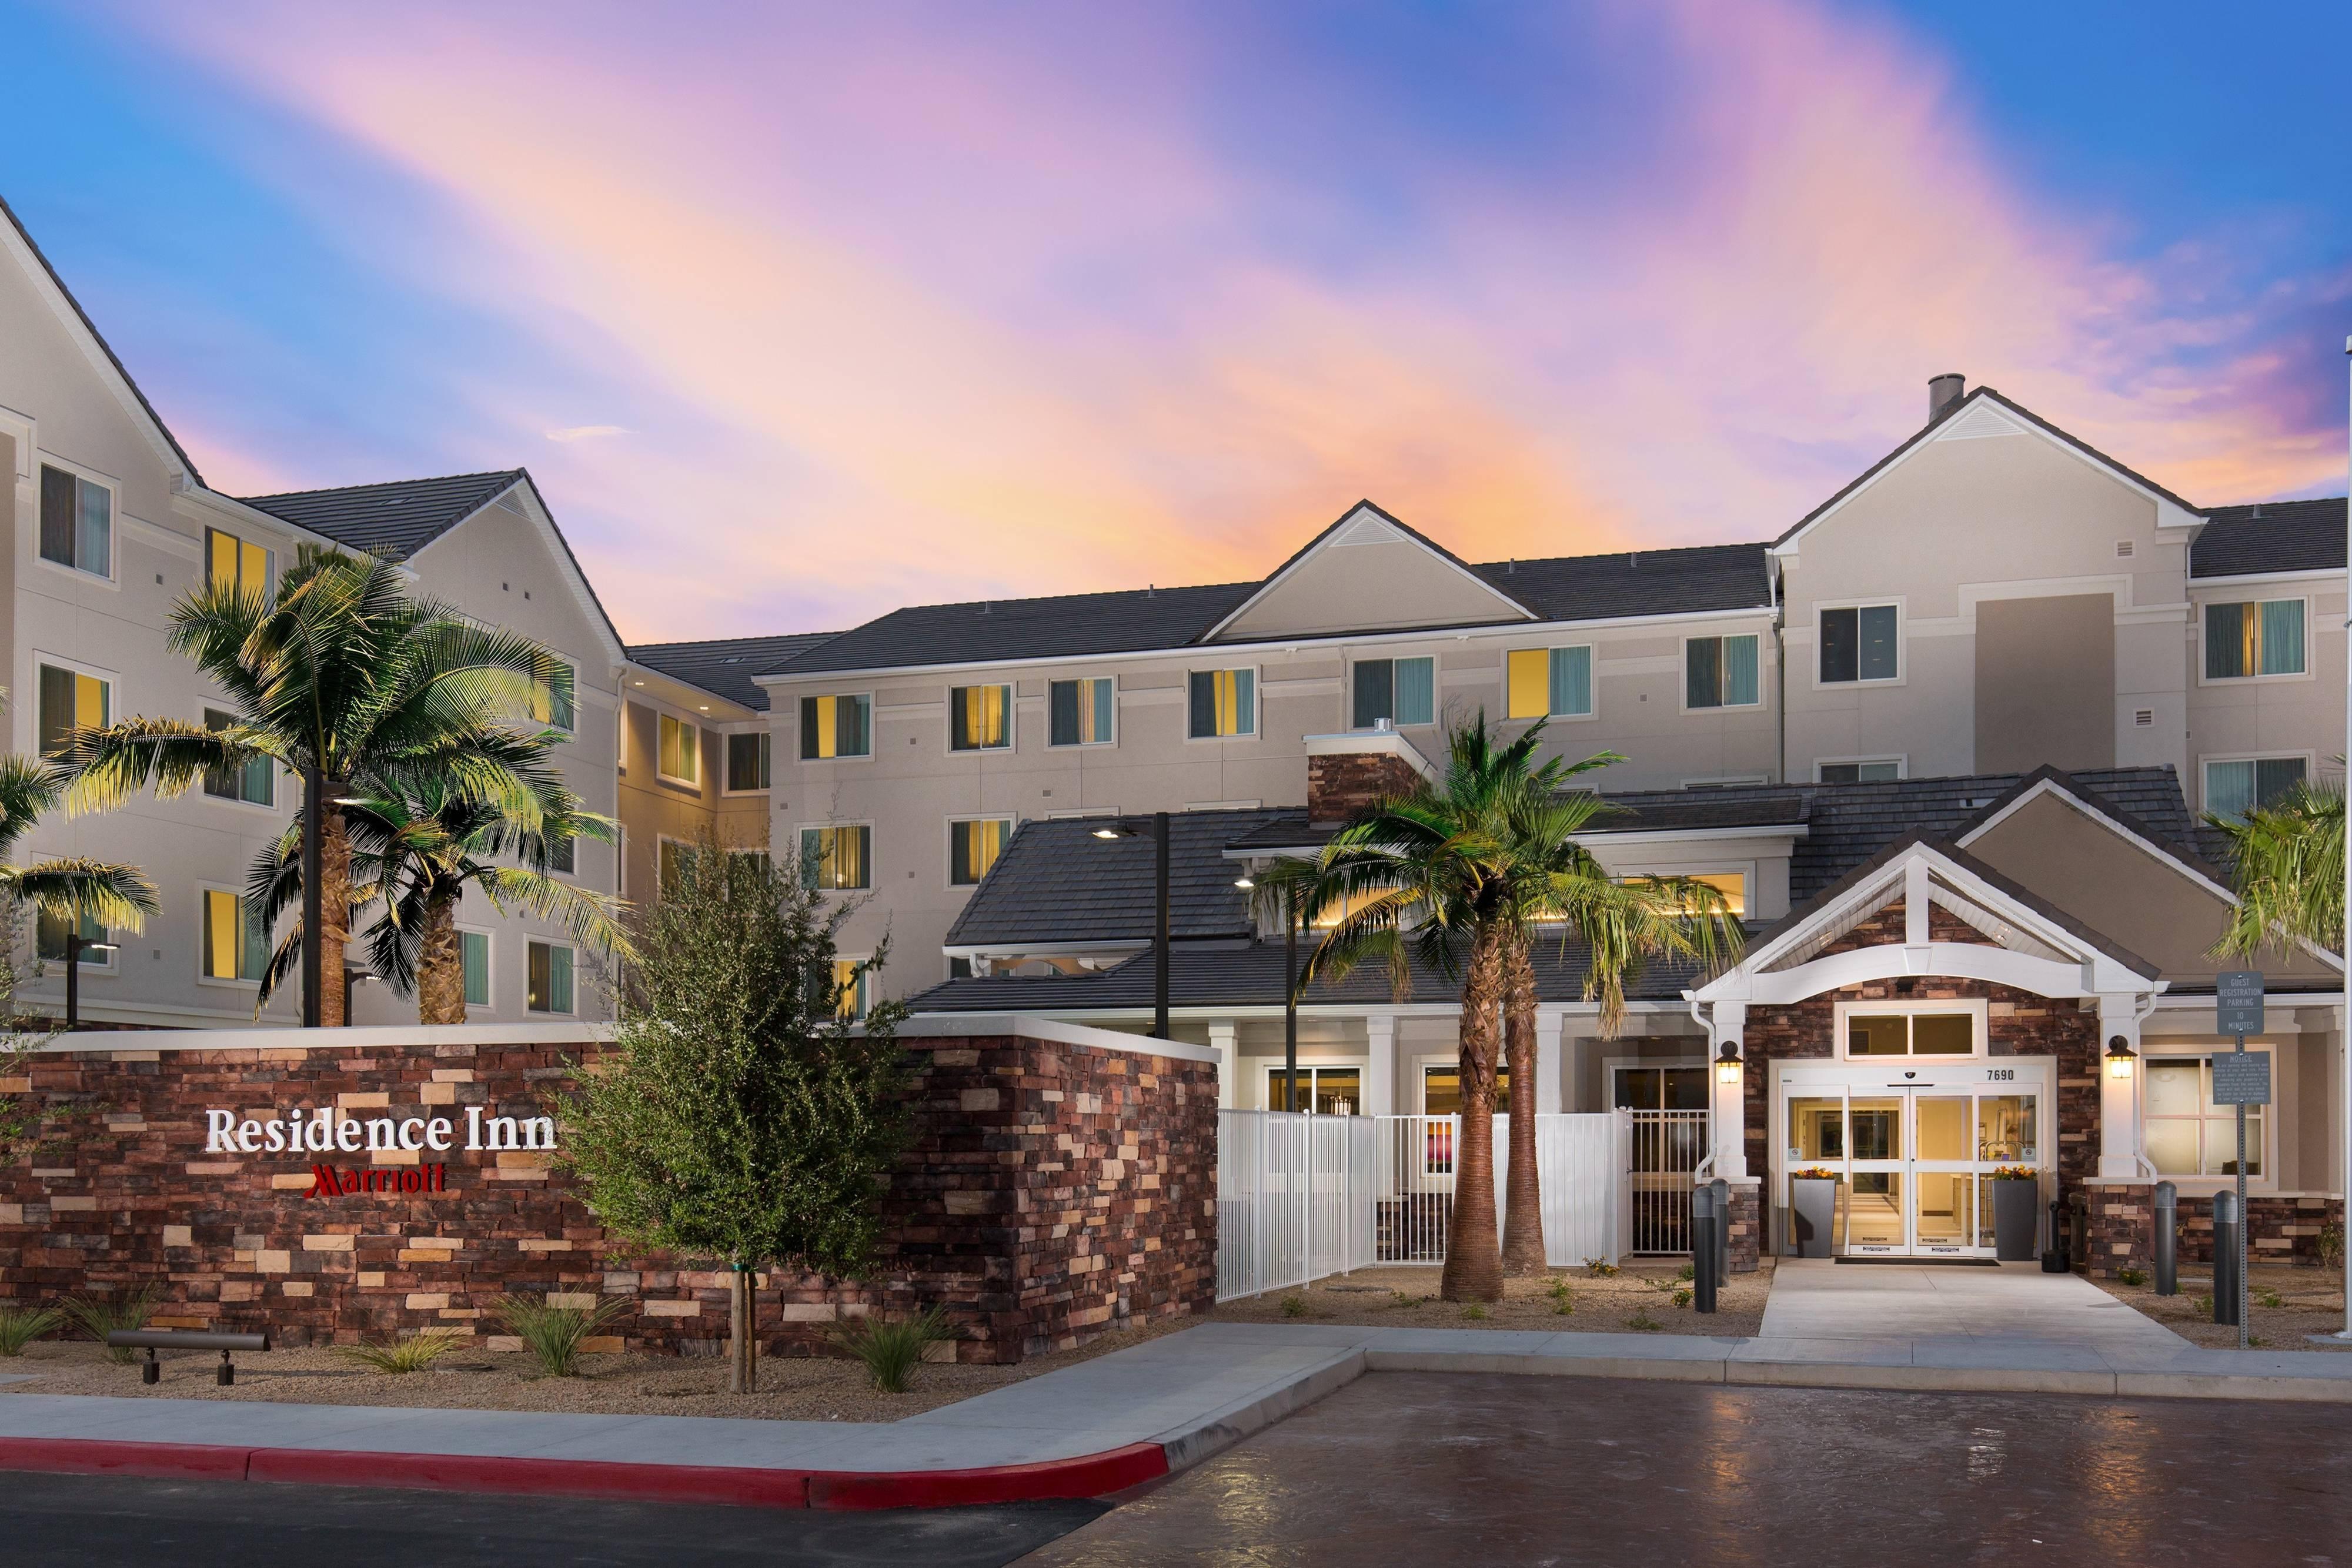 Residence Inn By Marriott Las Vegas Airport